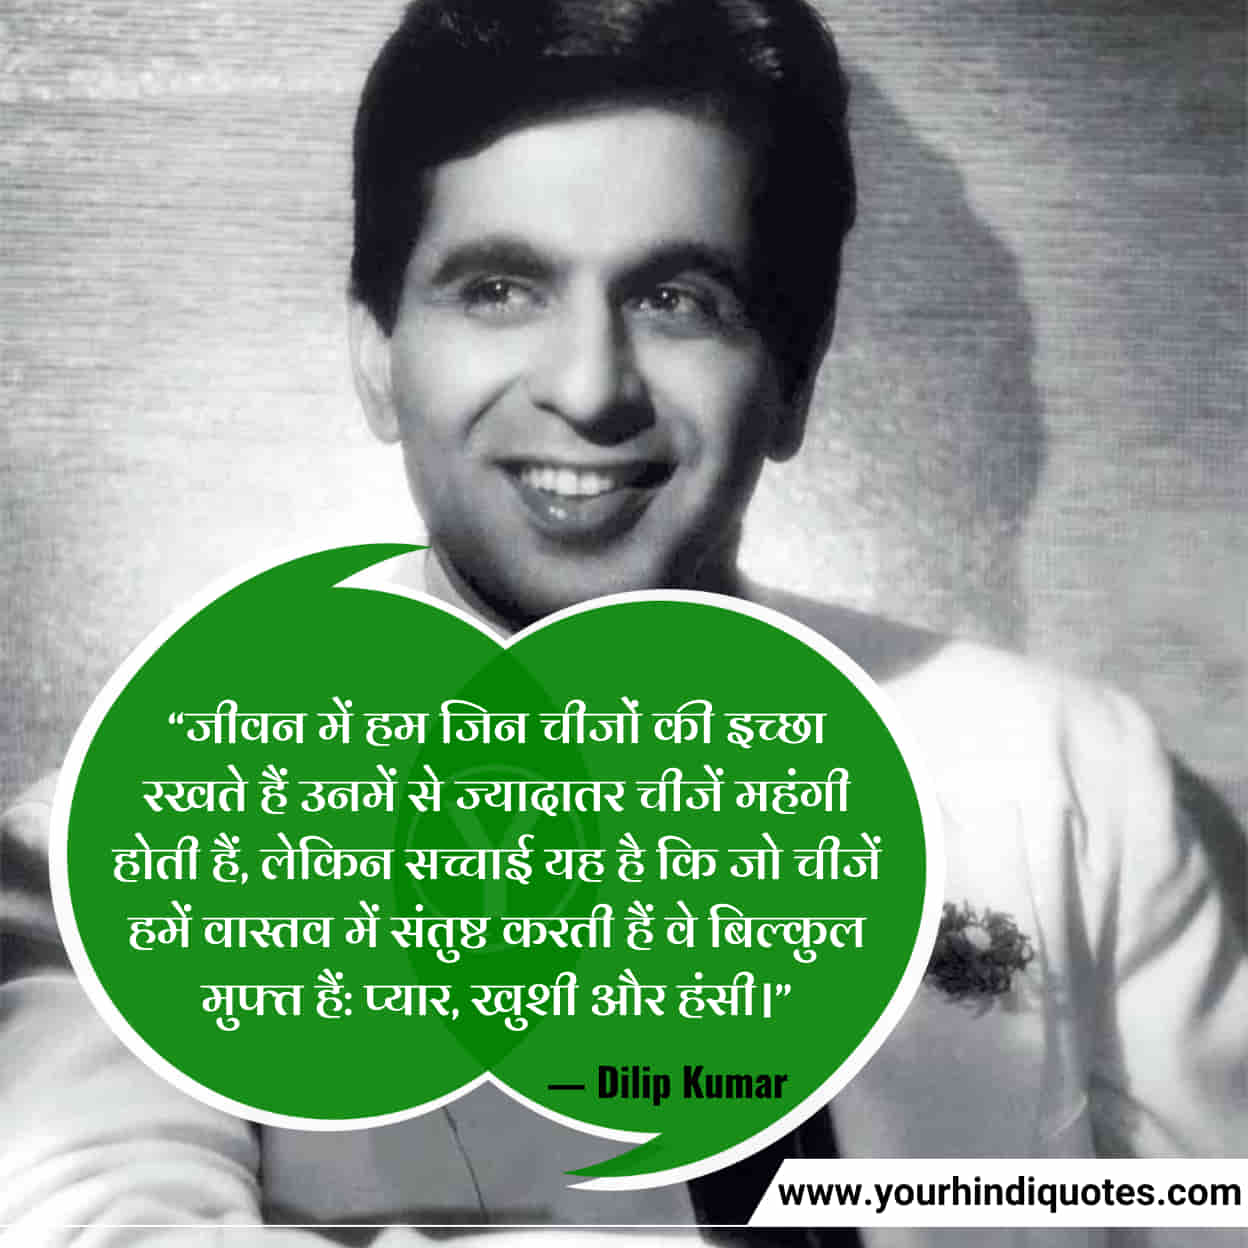 Dilip Kumar Hindi Quotes on Bollywood